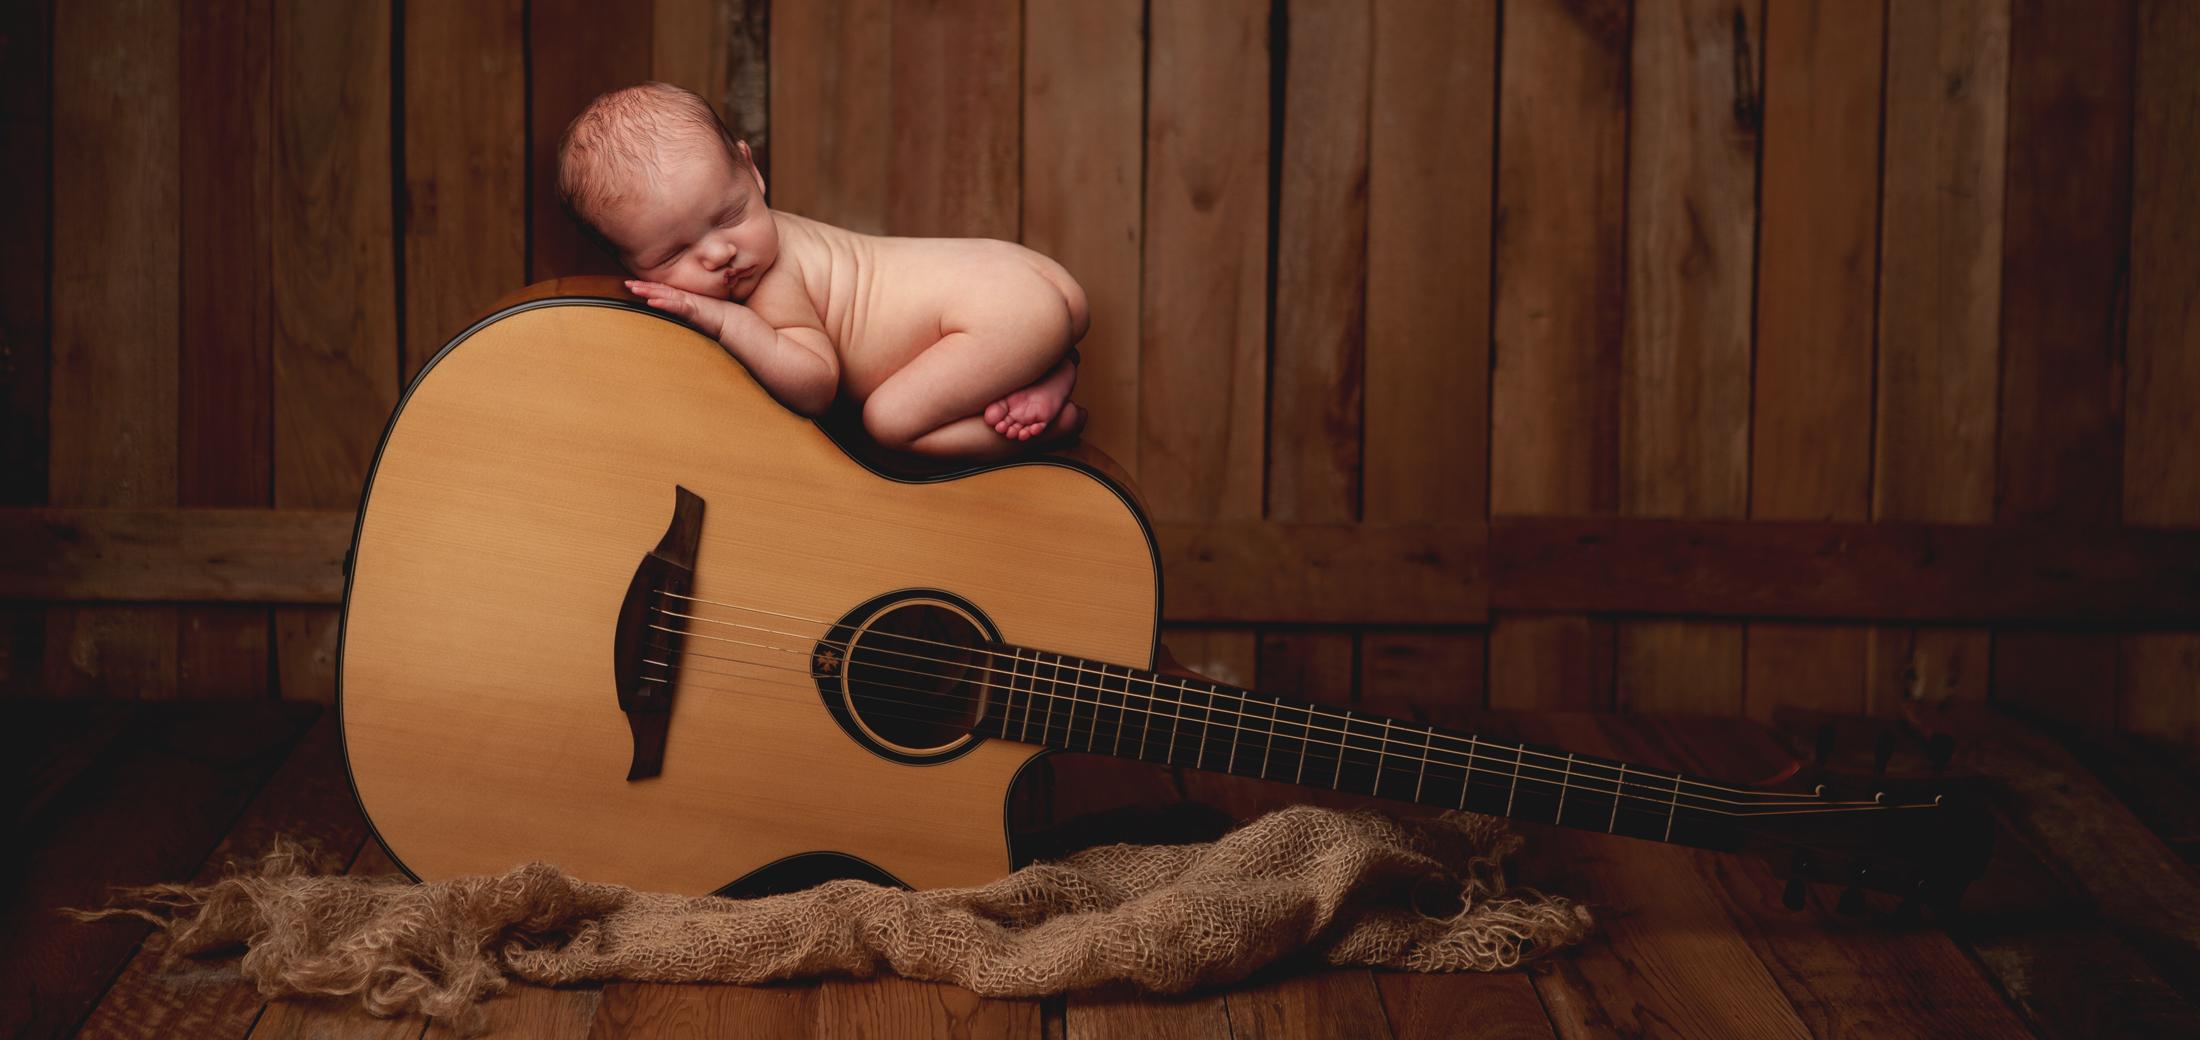 newborn on guitar photo